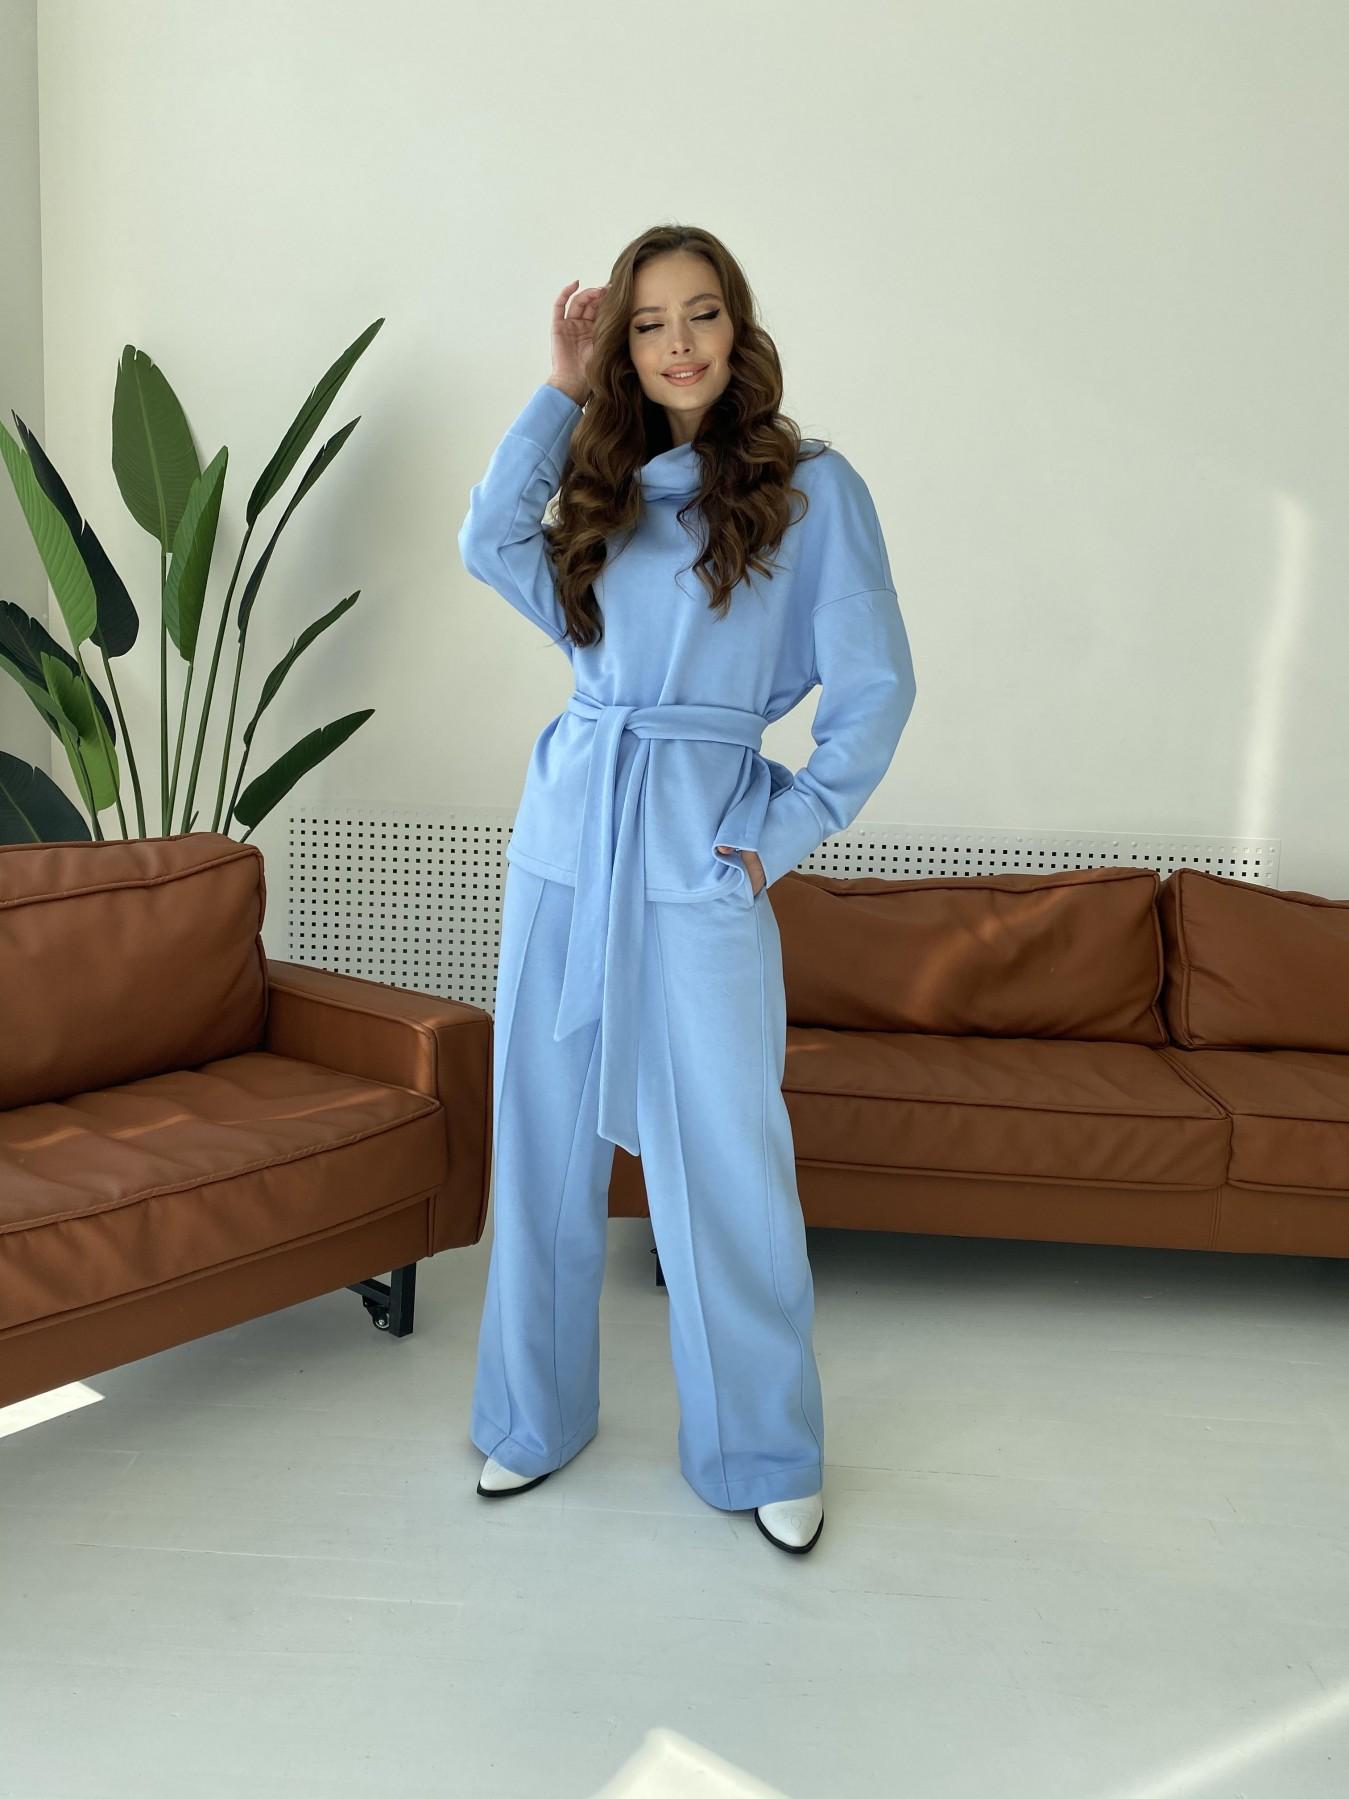 Джаст костюм Oversize  3х нитка 10564 АРТ. 47245 Цвет: Голубой - фото 1, интернет магазин tm-modus.ru